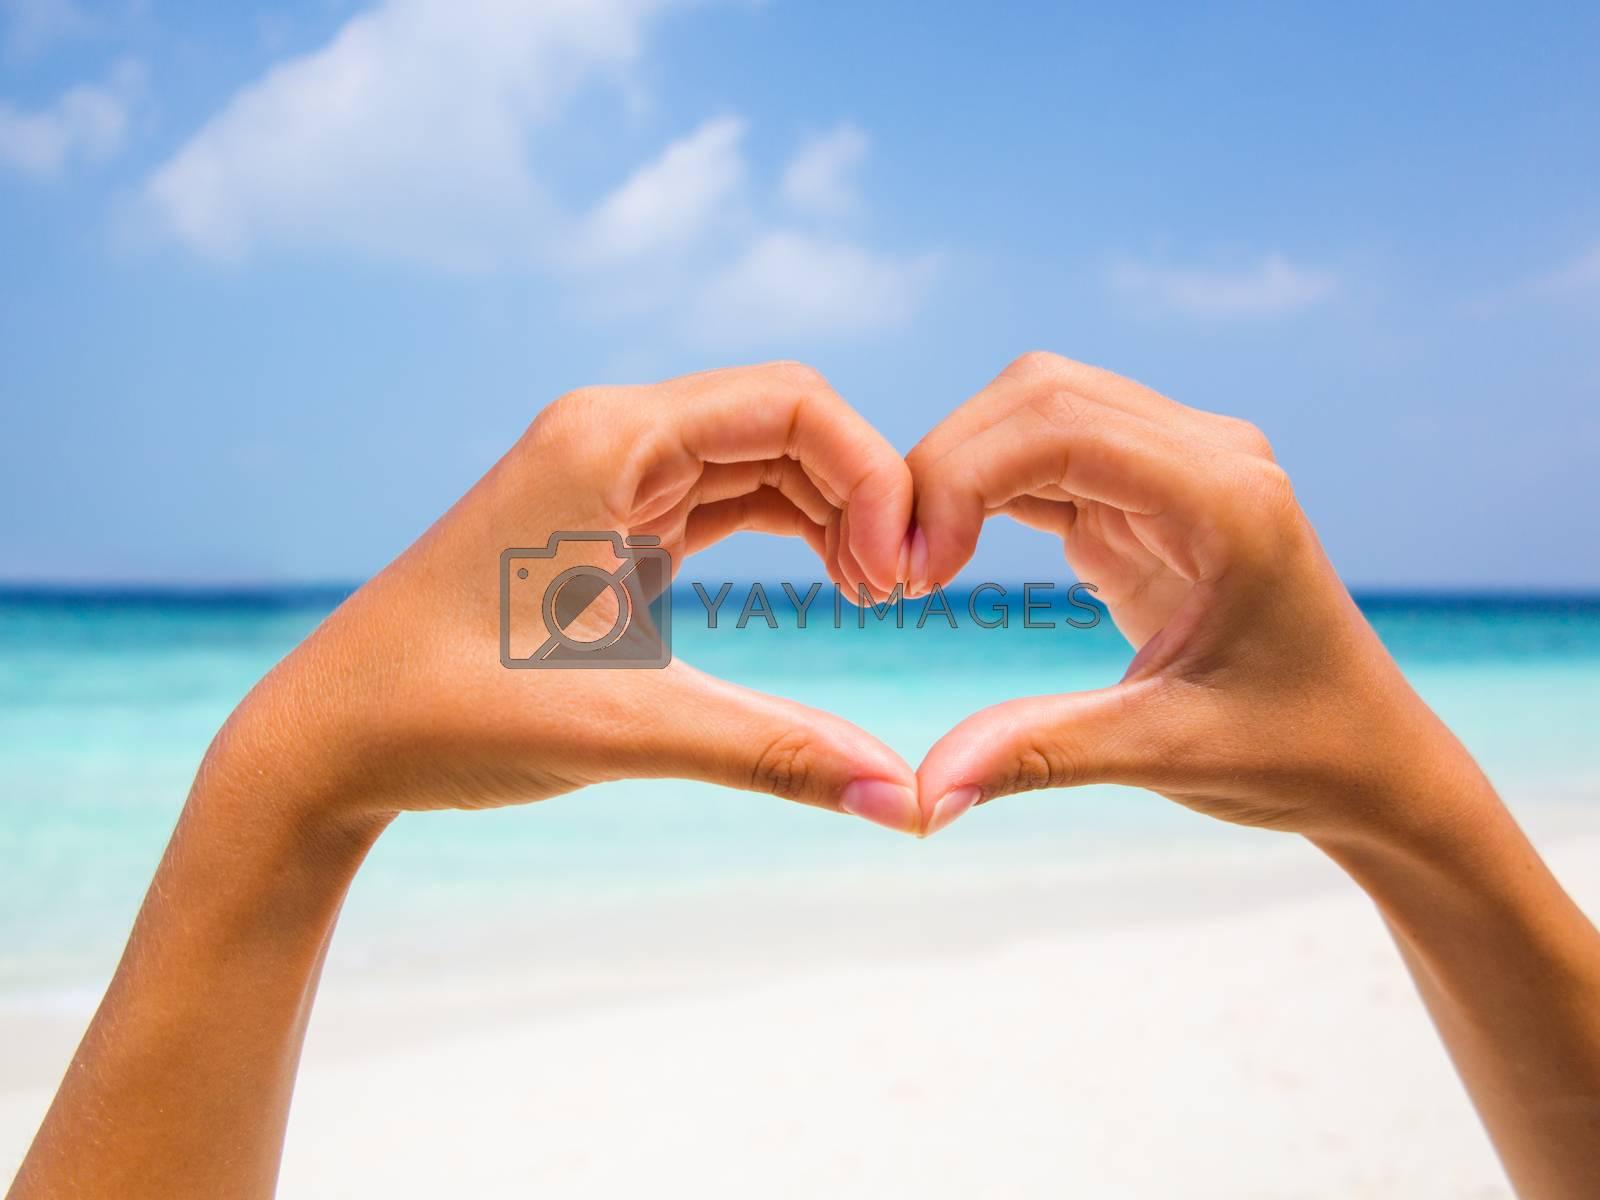 Hands making a heart shape on the beach backgound